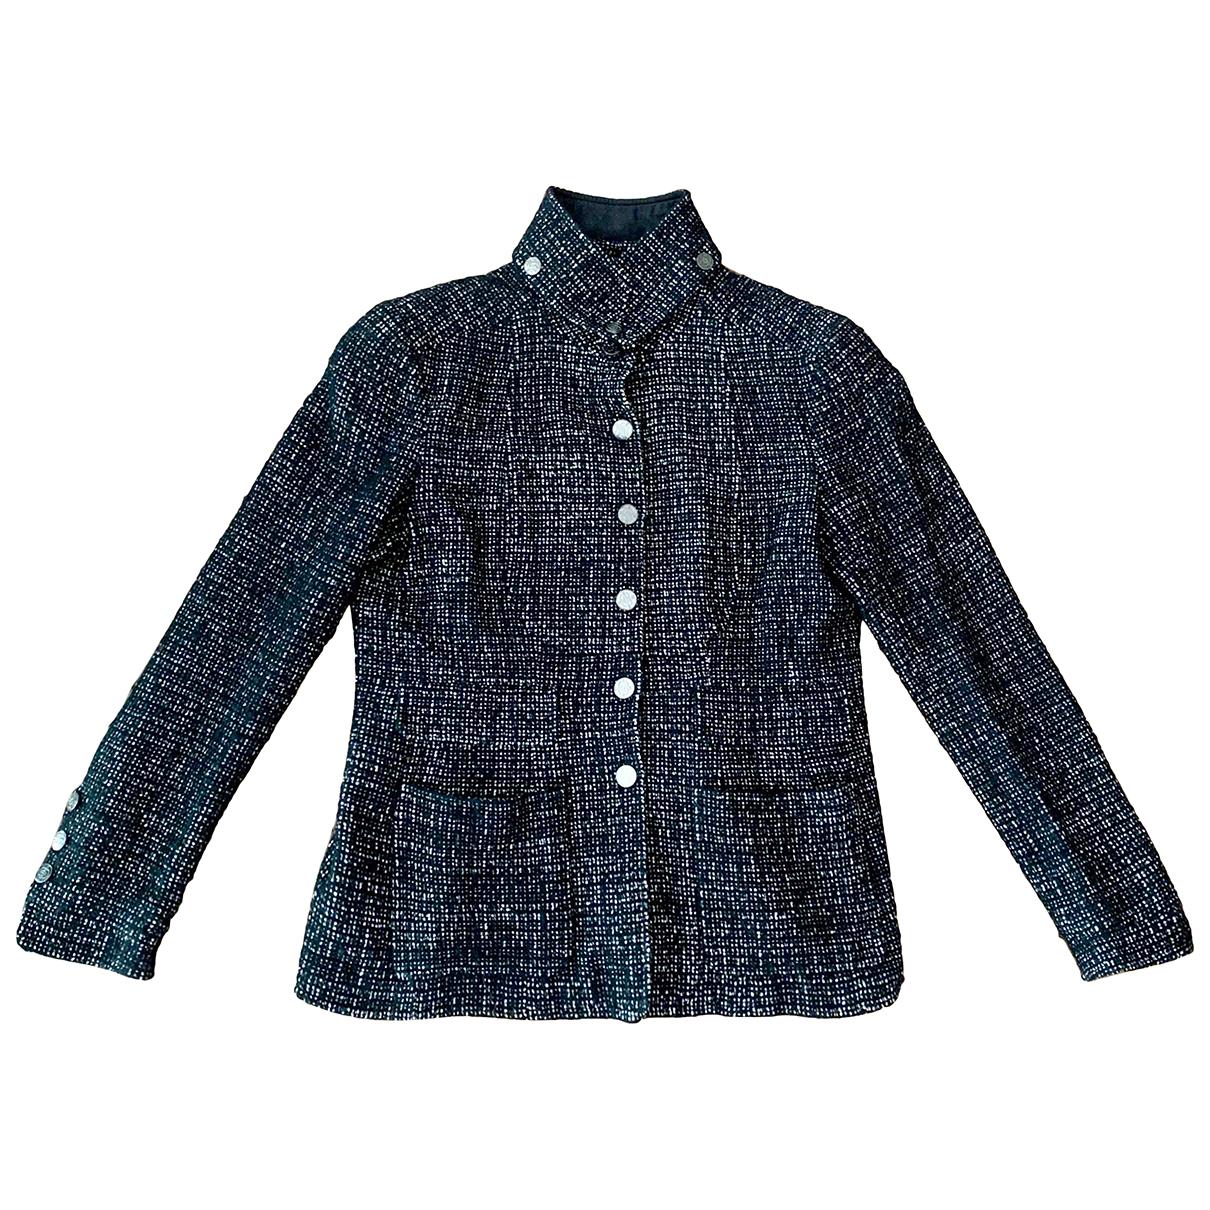 Chanel \N Multicolour jacket for Women 42 FR